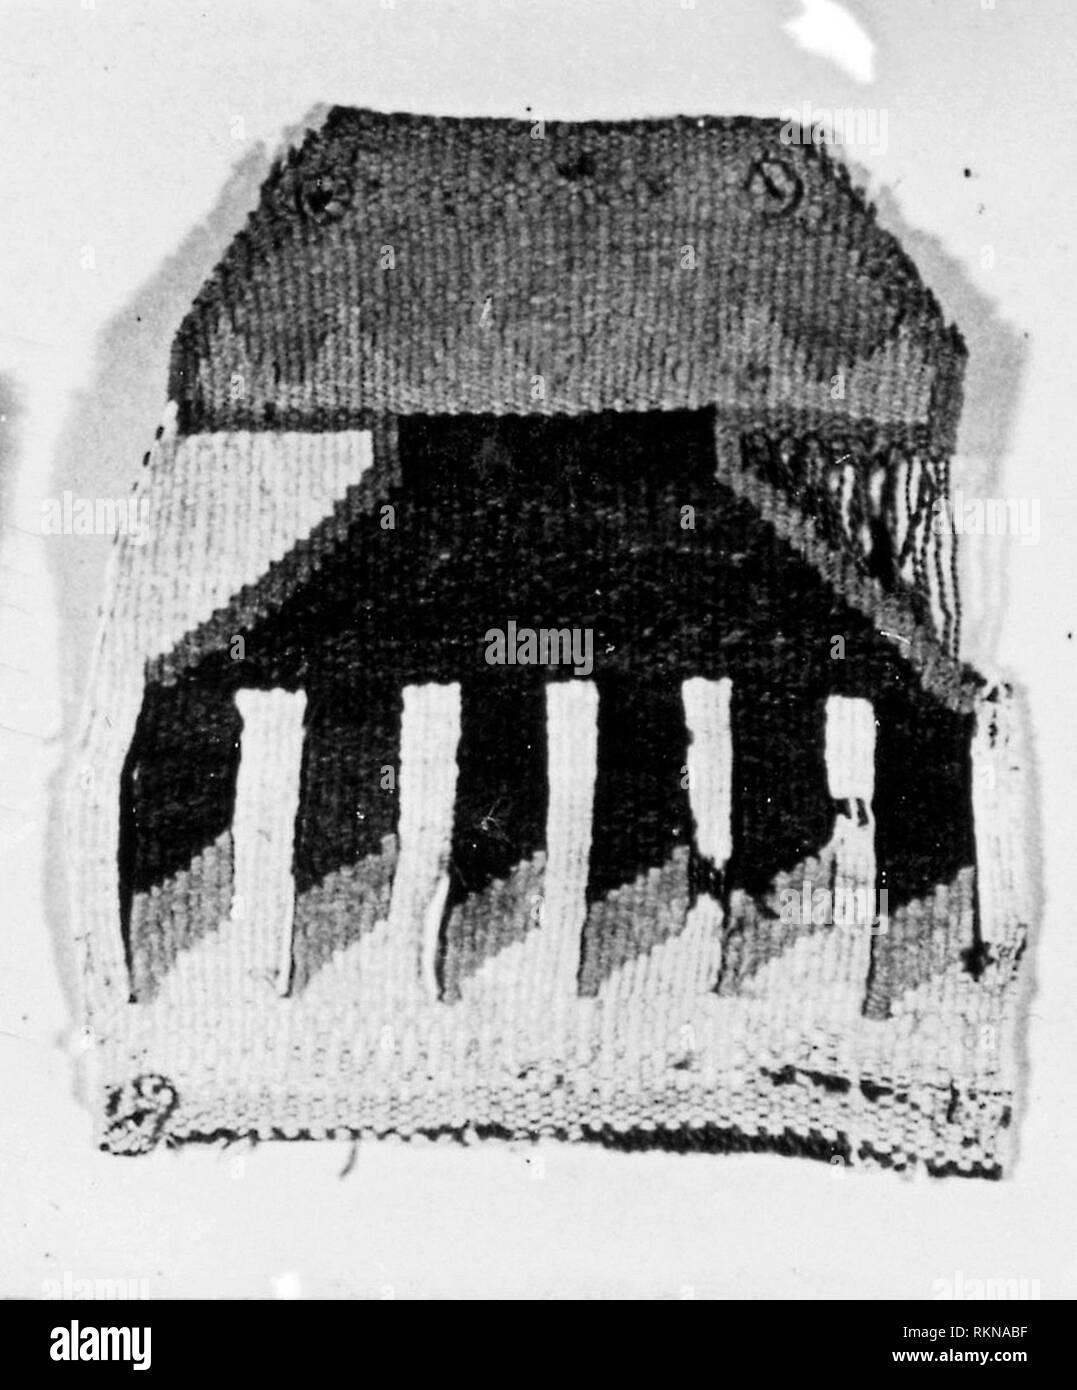 Patch - A.D. 1000/1476 - Lambayeque Probably north coast, Peru - Artist: Lambayeque, Origin: Peru, Date: 1000–1476, Medium: Slit tapestry, simple - Stock Image